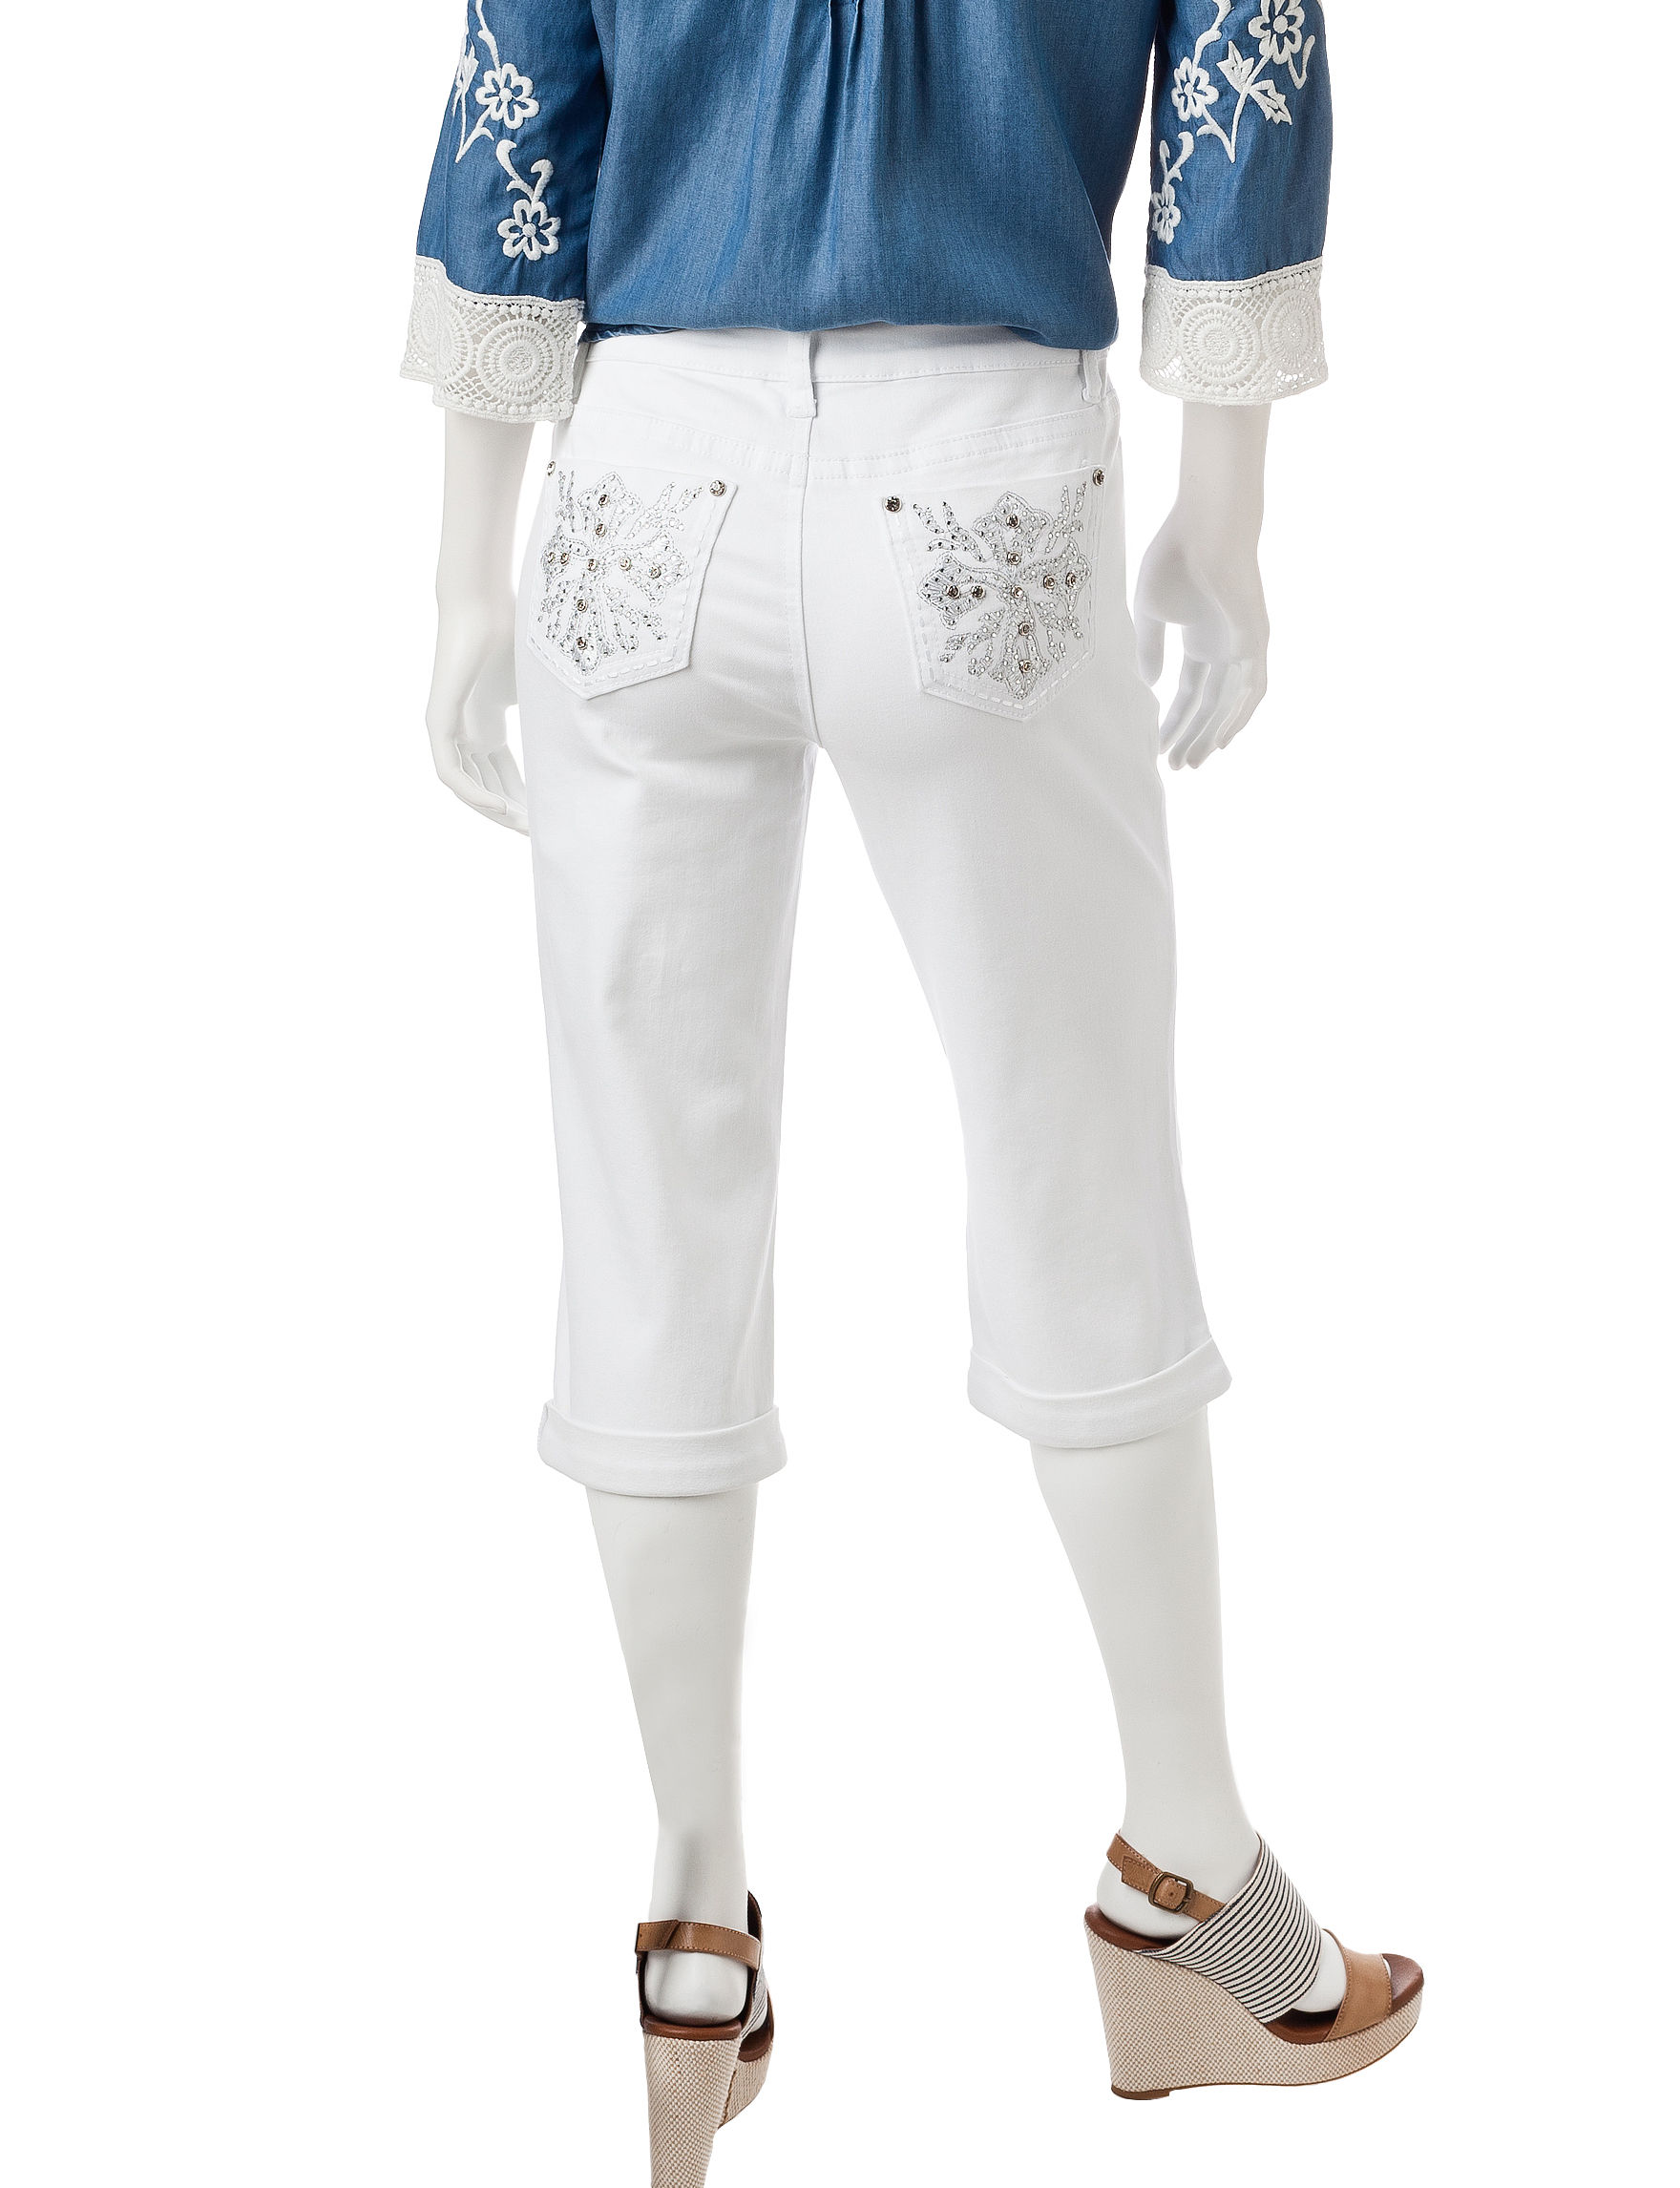 Earl Jean Petite Bling Capri Pants | Stage Stores